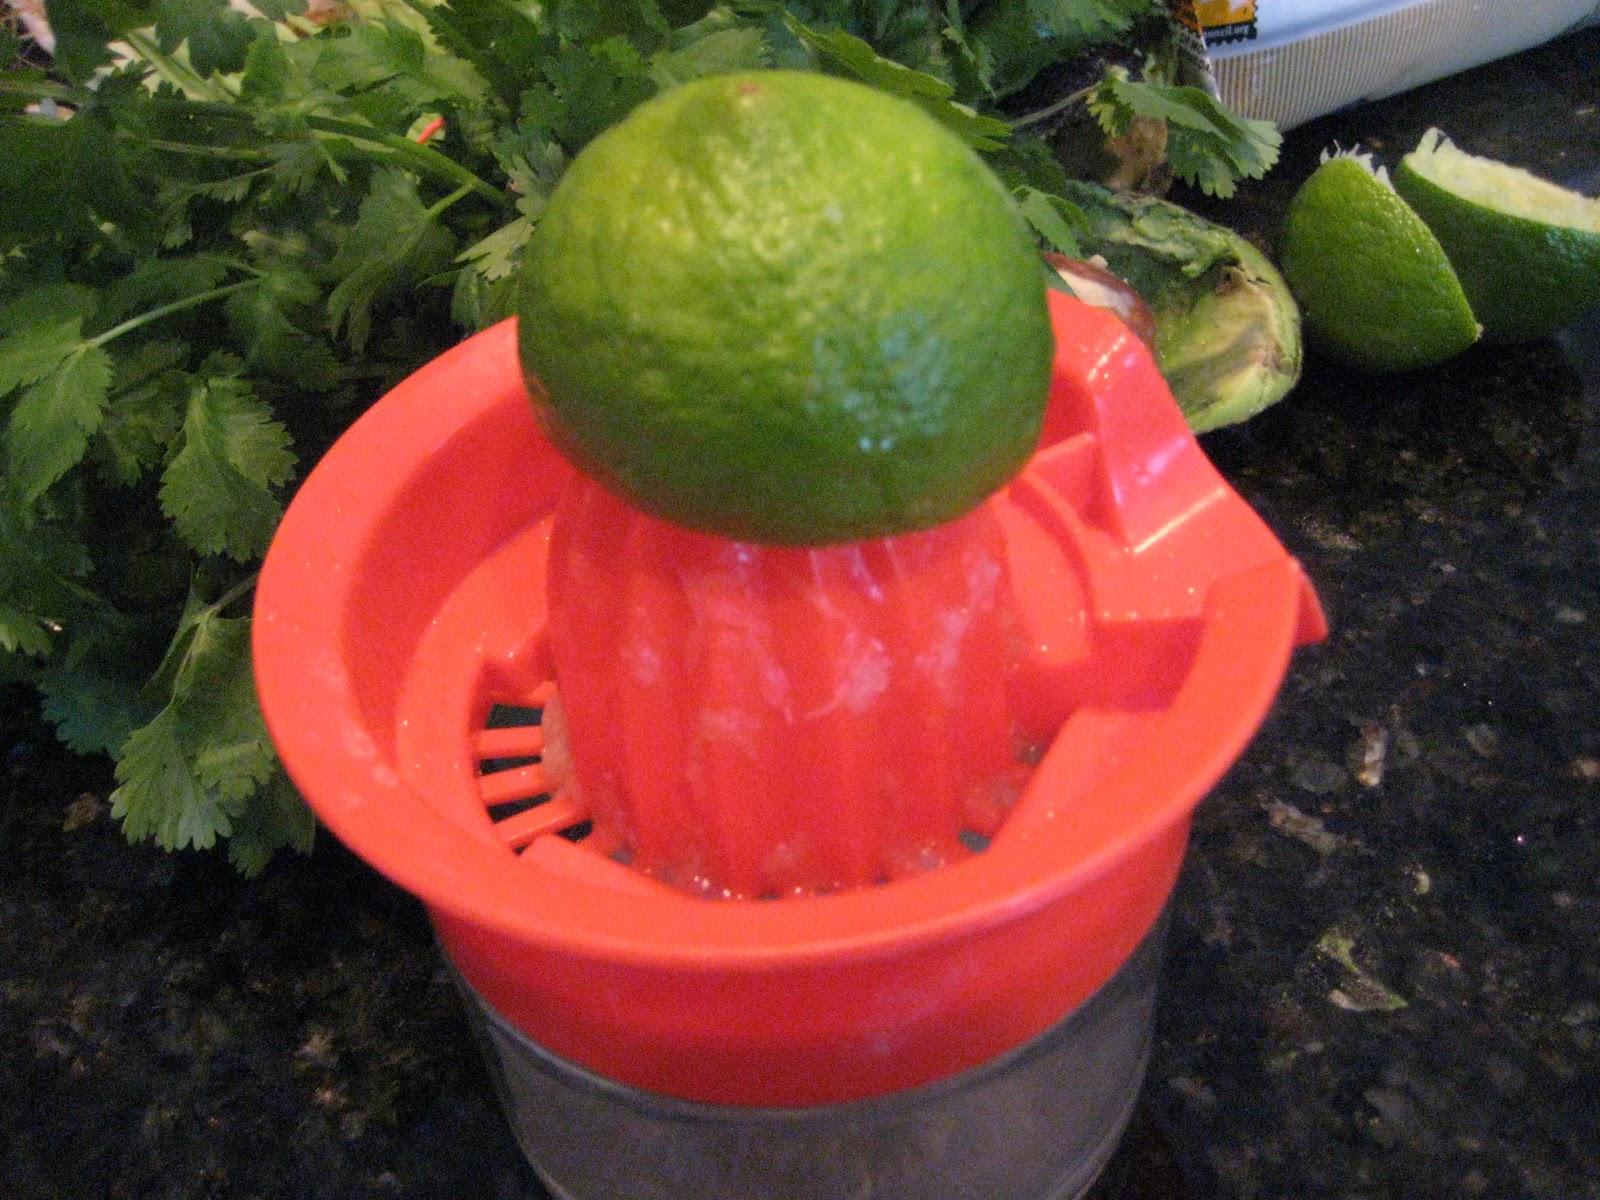 Limes and cilantro